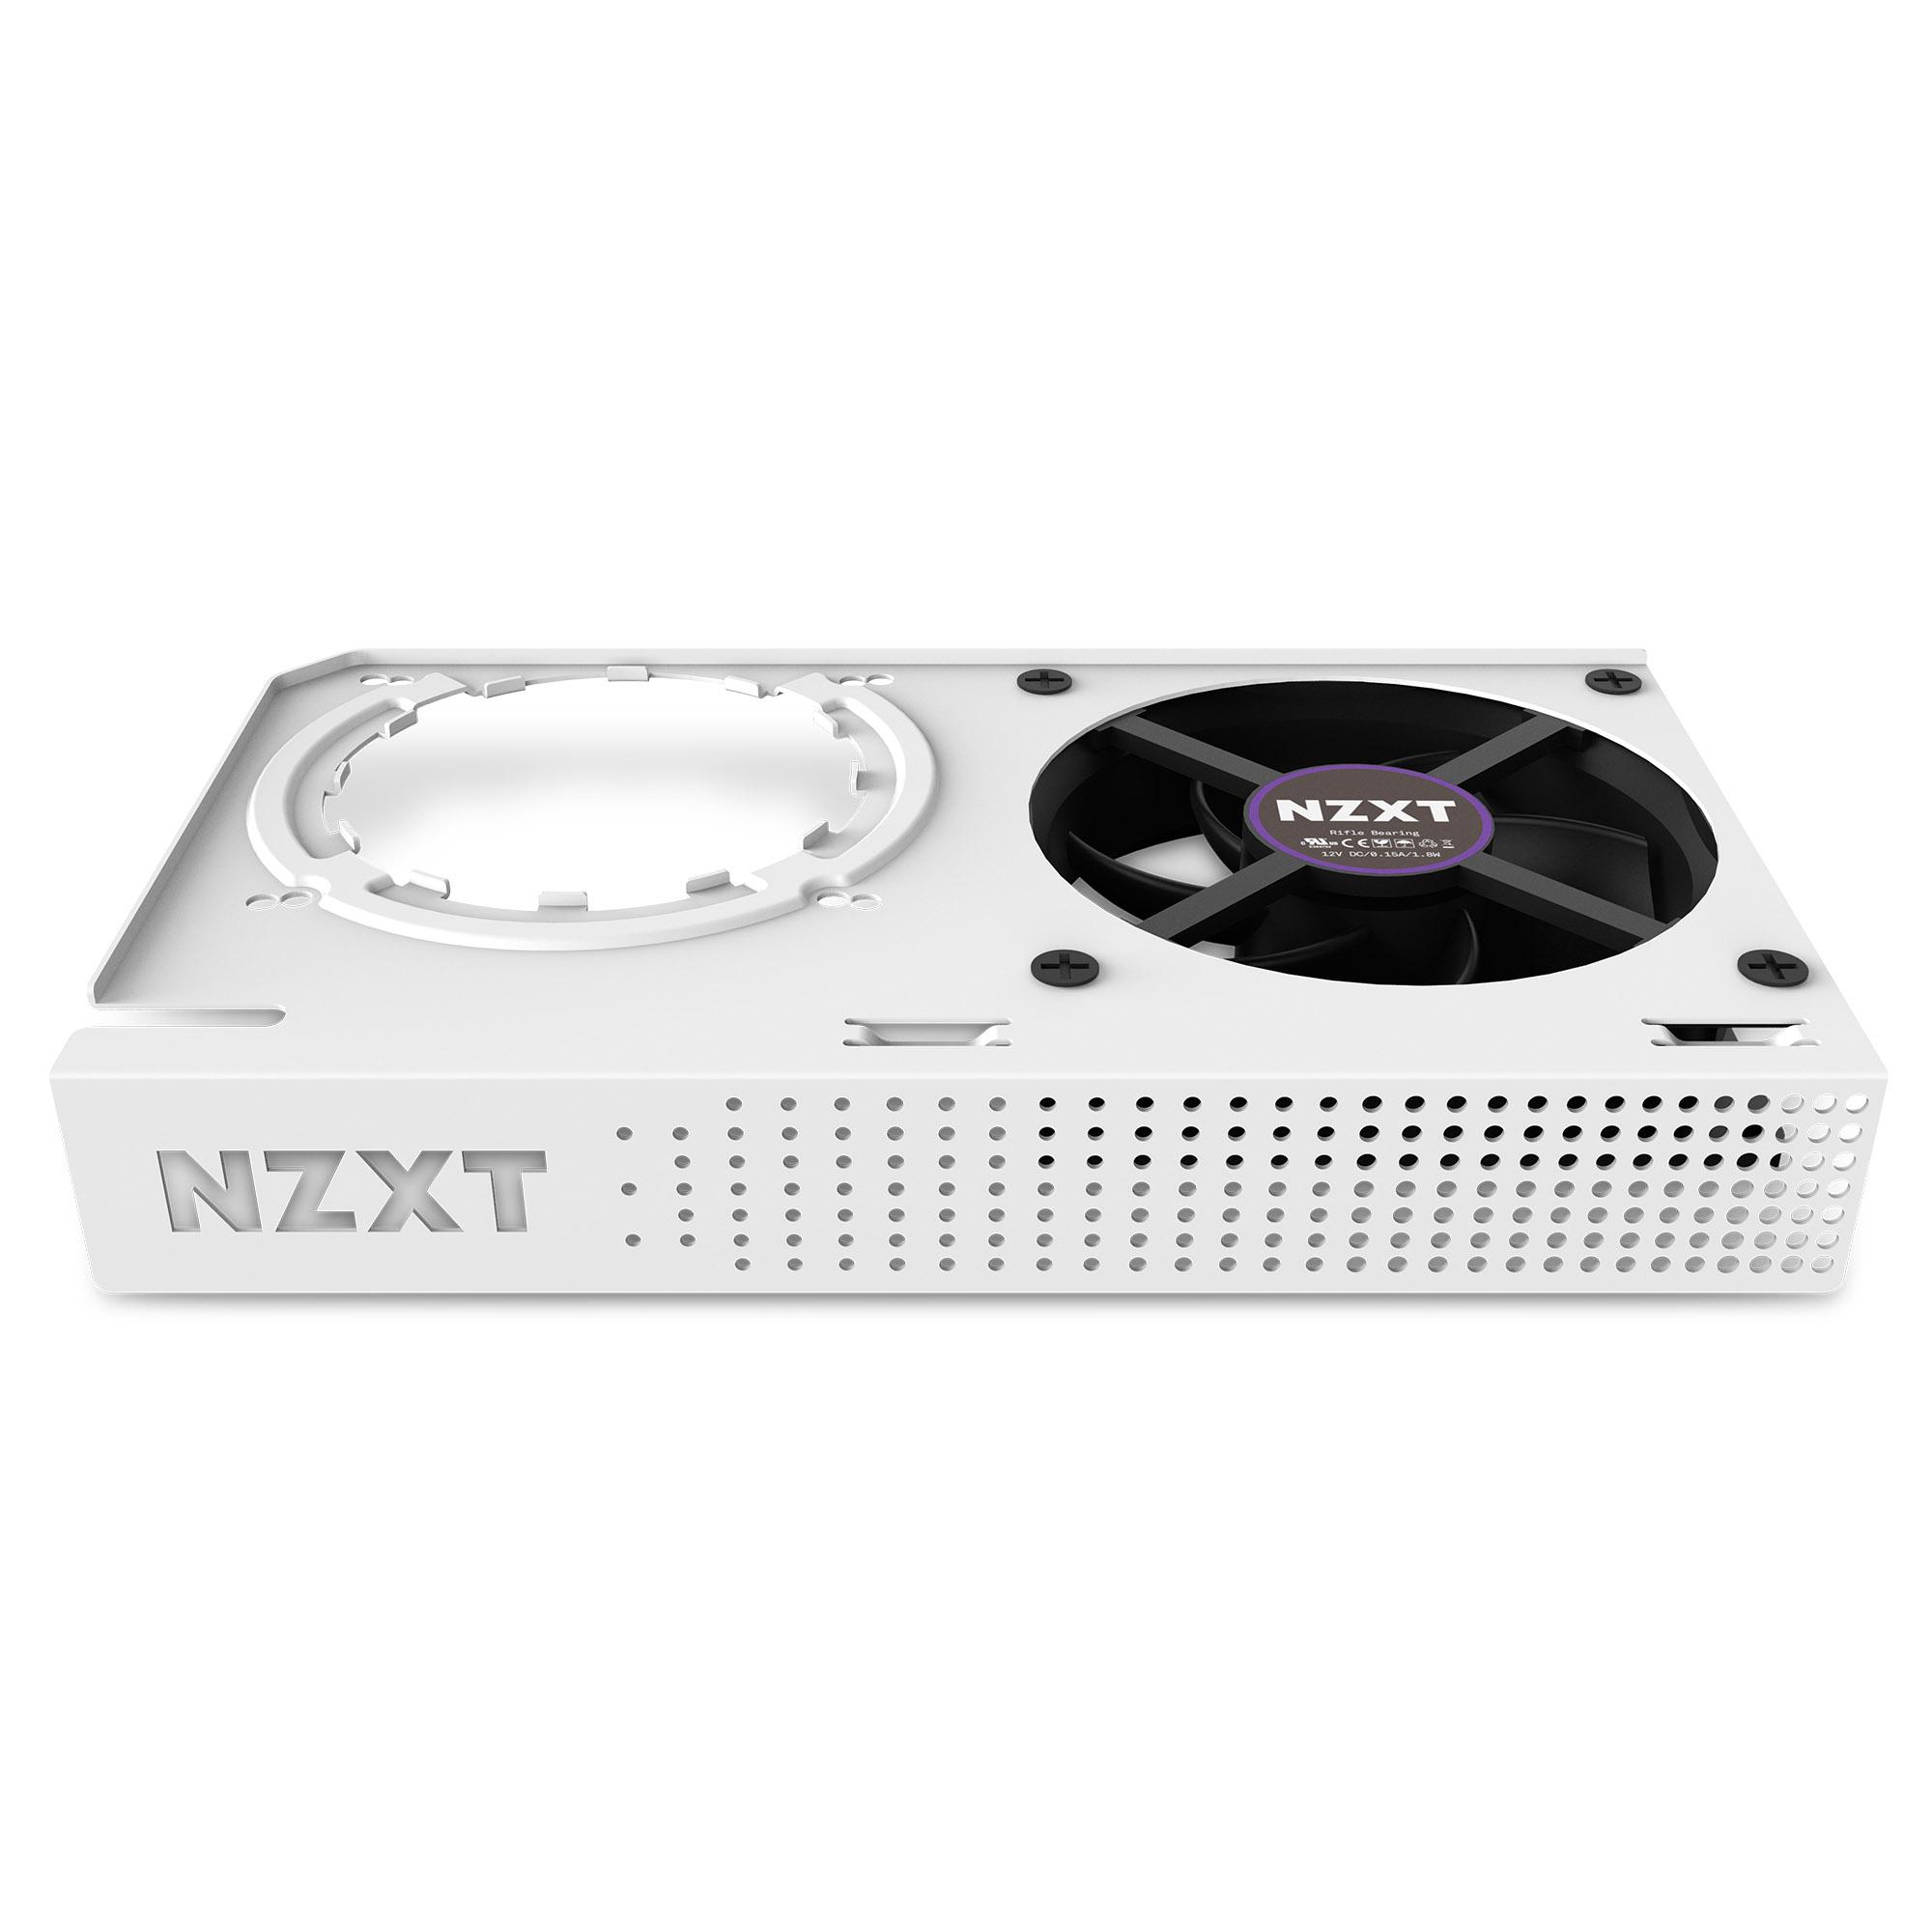 NZXT恩傑 Kraken【G12】GPU Bracket 散熱器支架 CPU散熱器 系統散熱器【迪特軍】